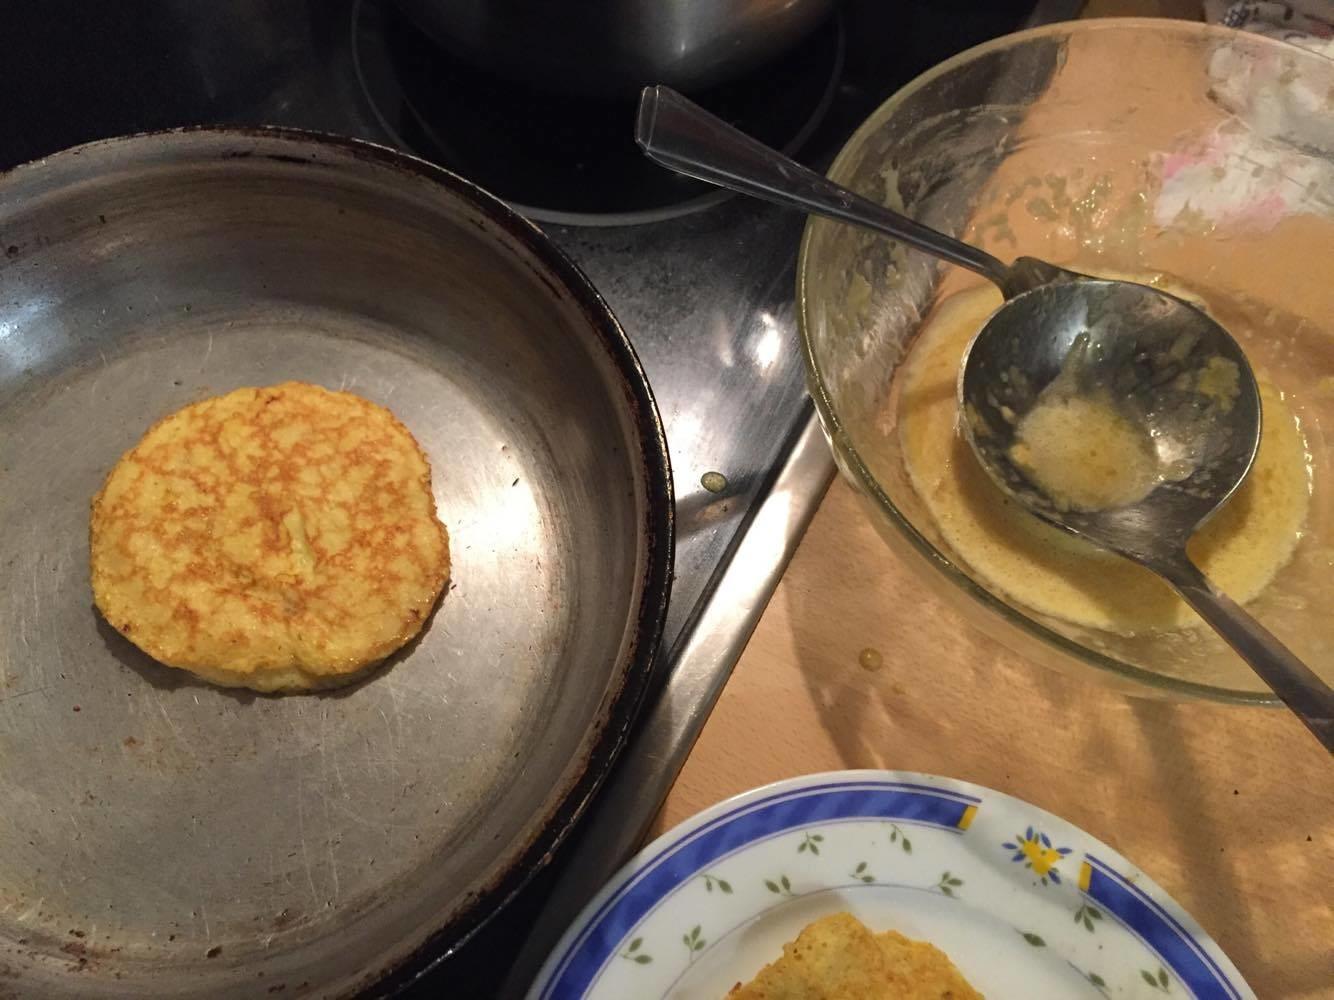 pancakes-platano-f8a1edc321b53662f3fea2c